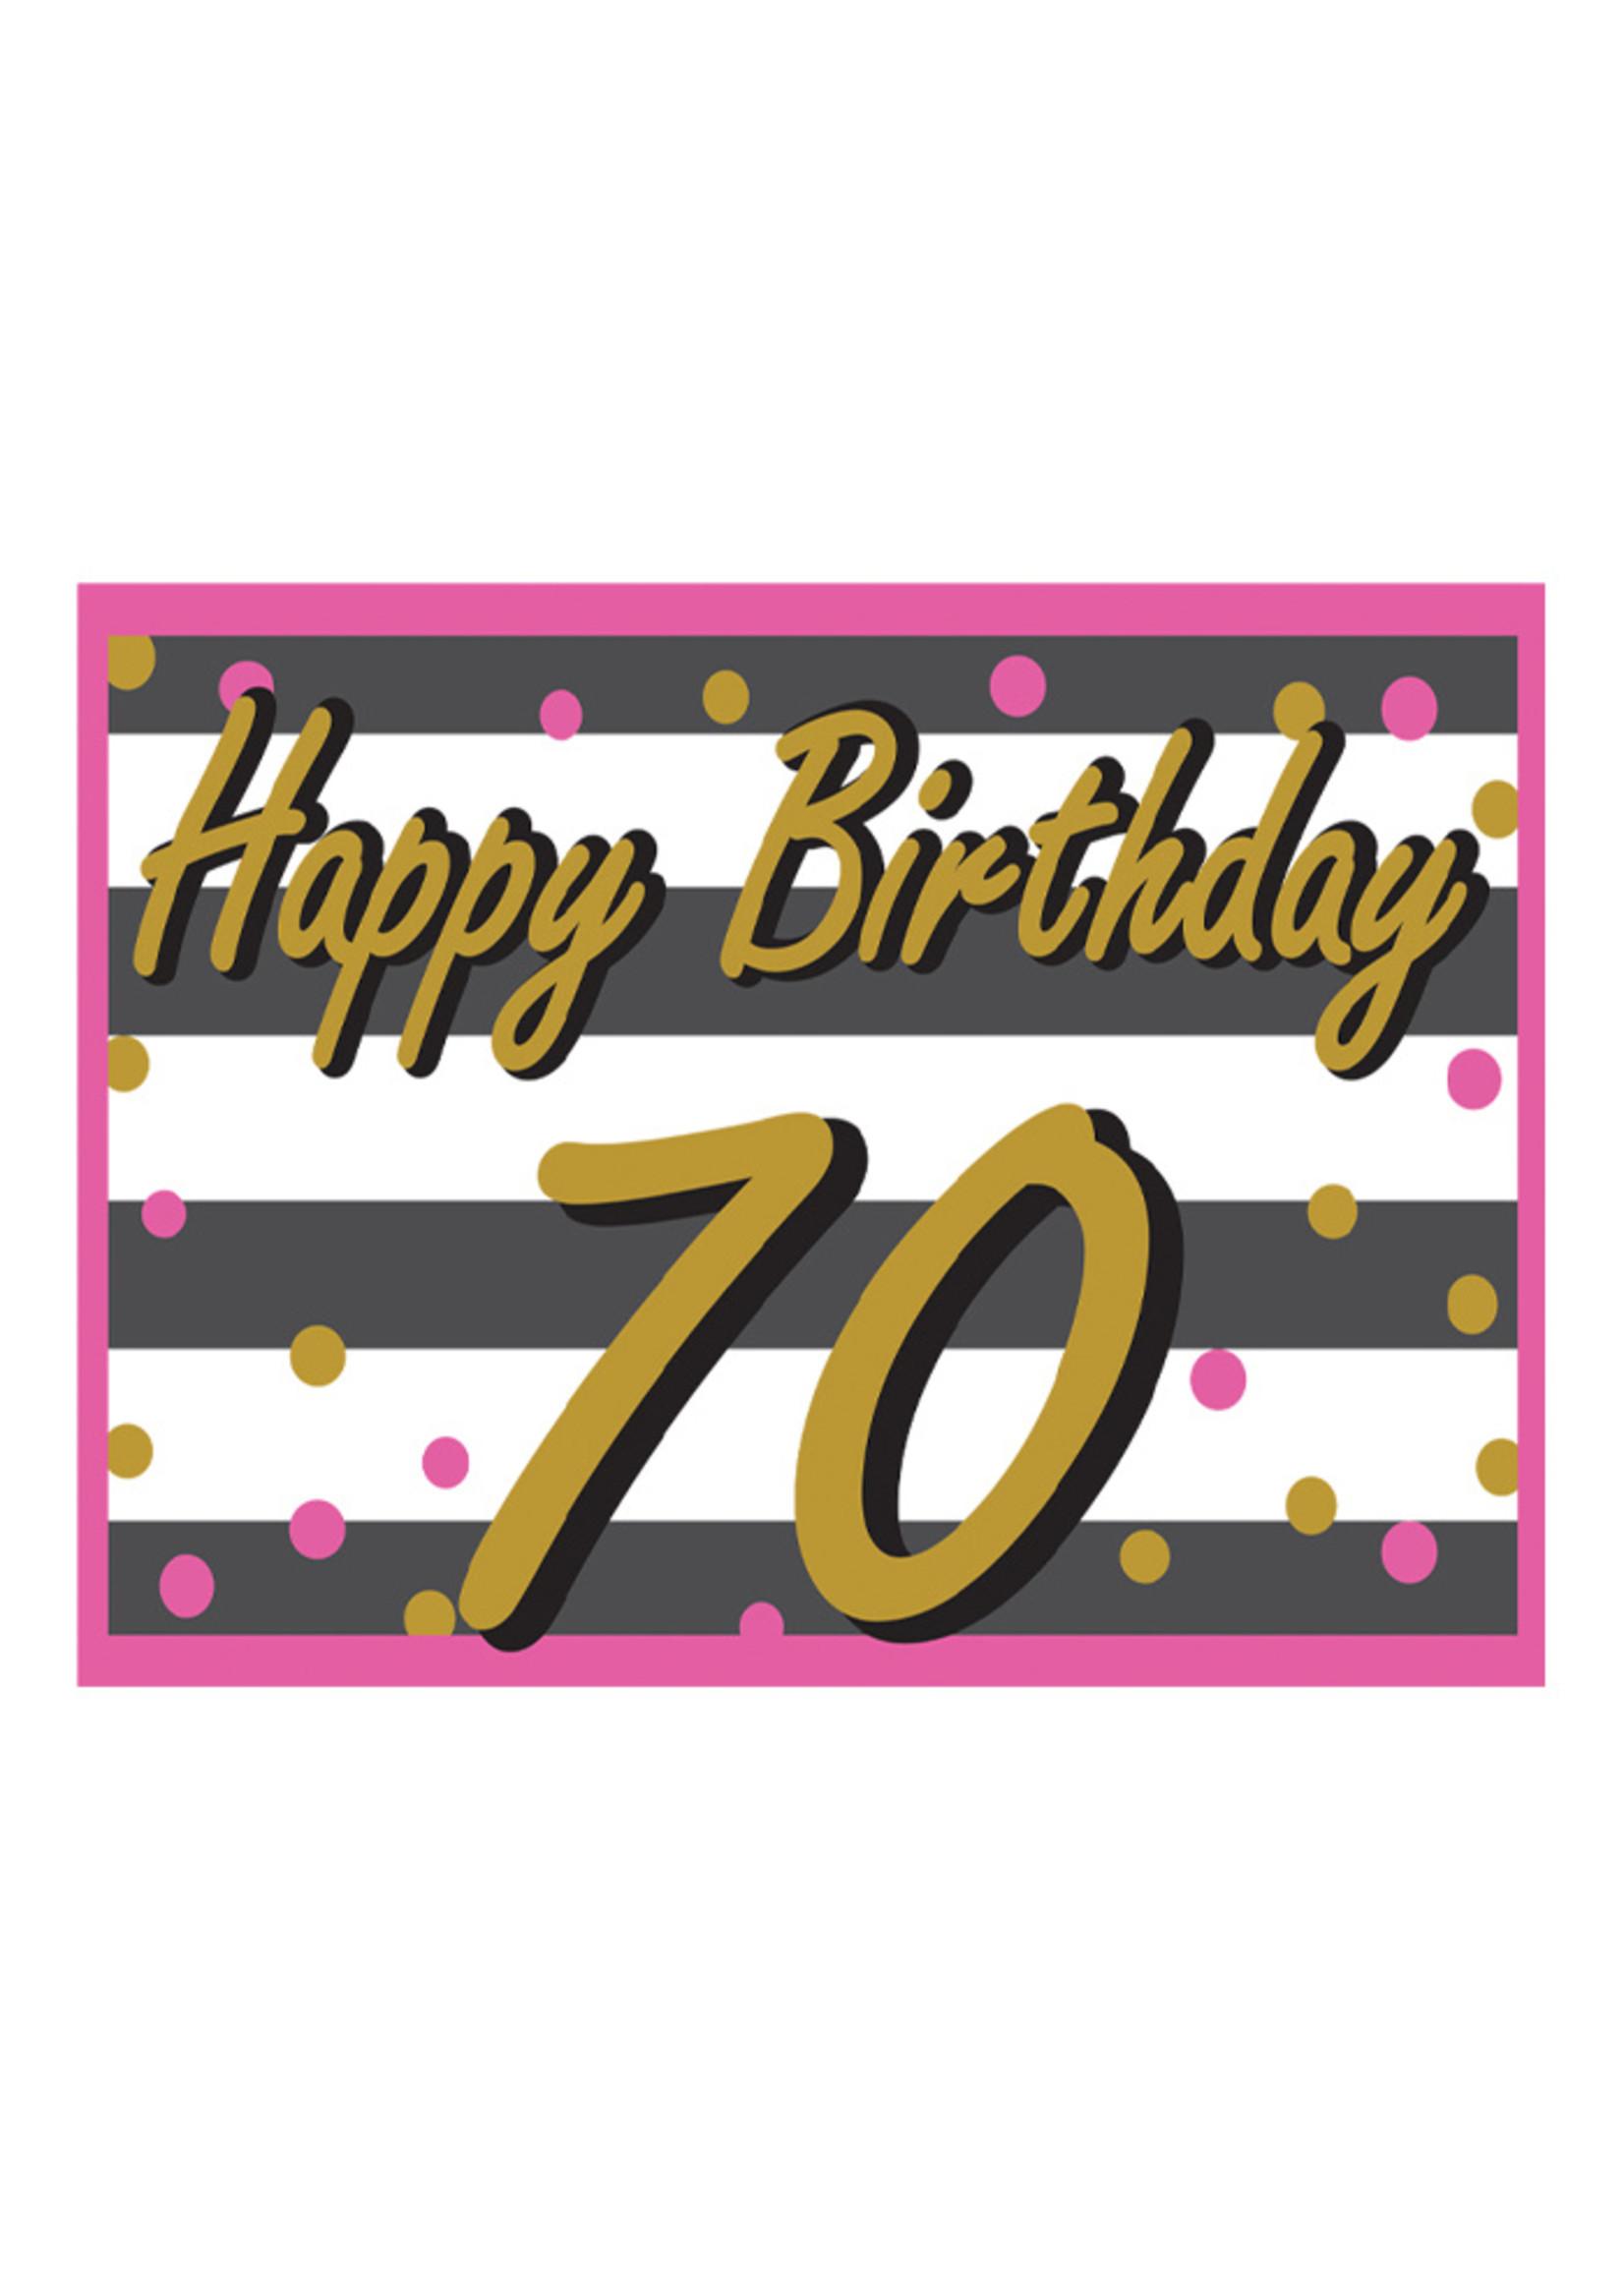 Happy Birthday 70th Pink & Gold Yard Sign